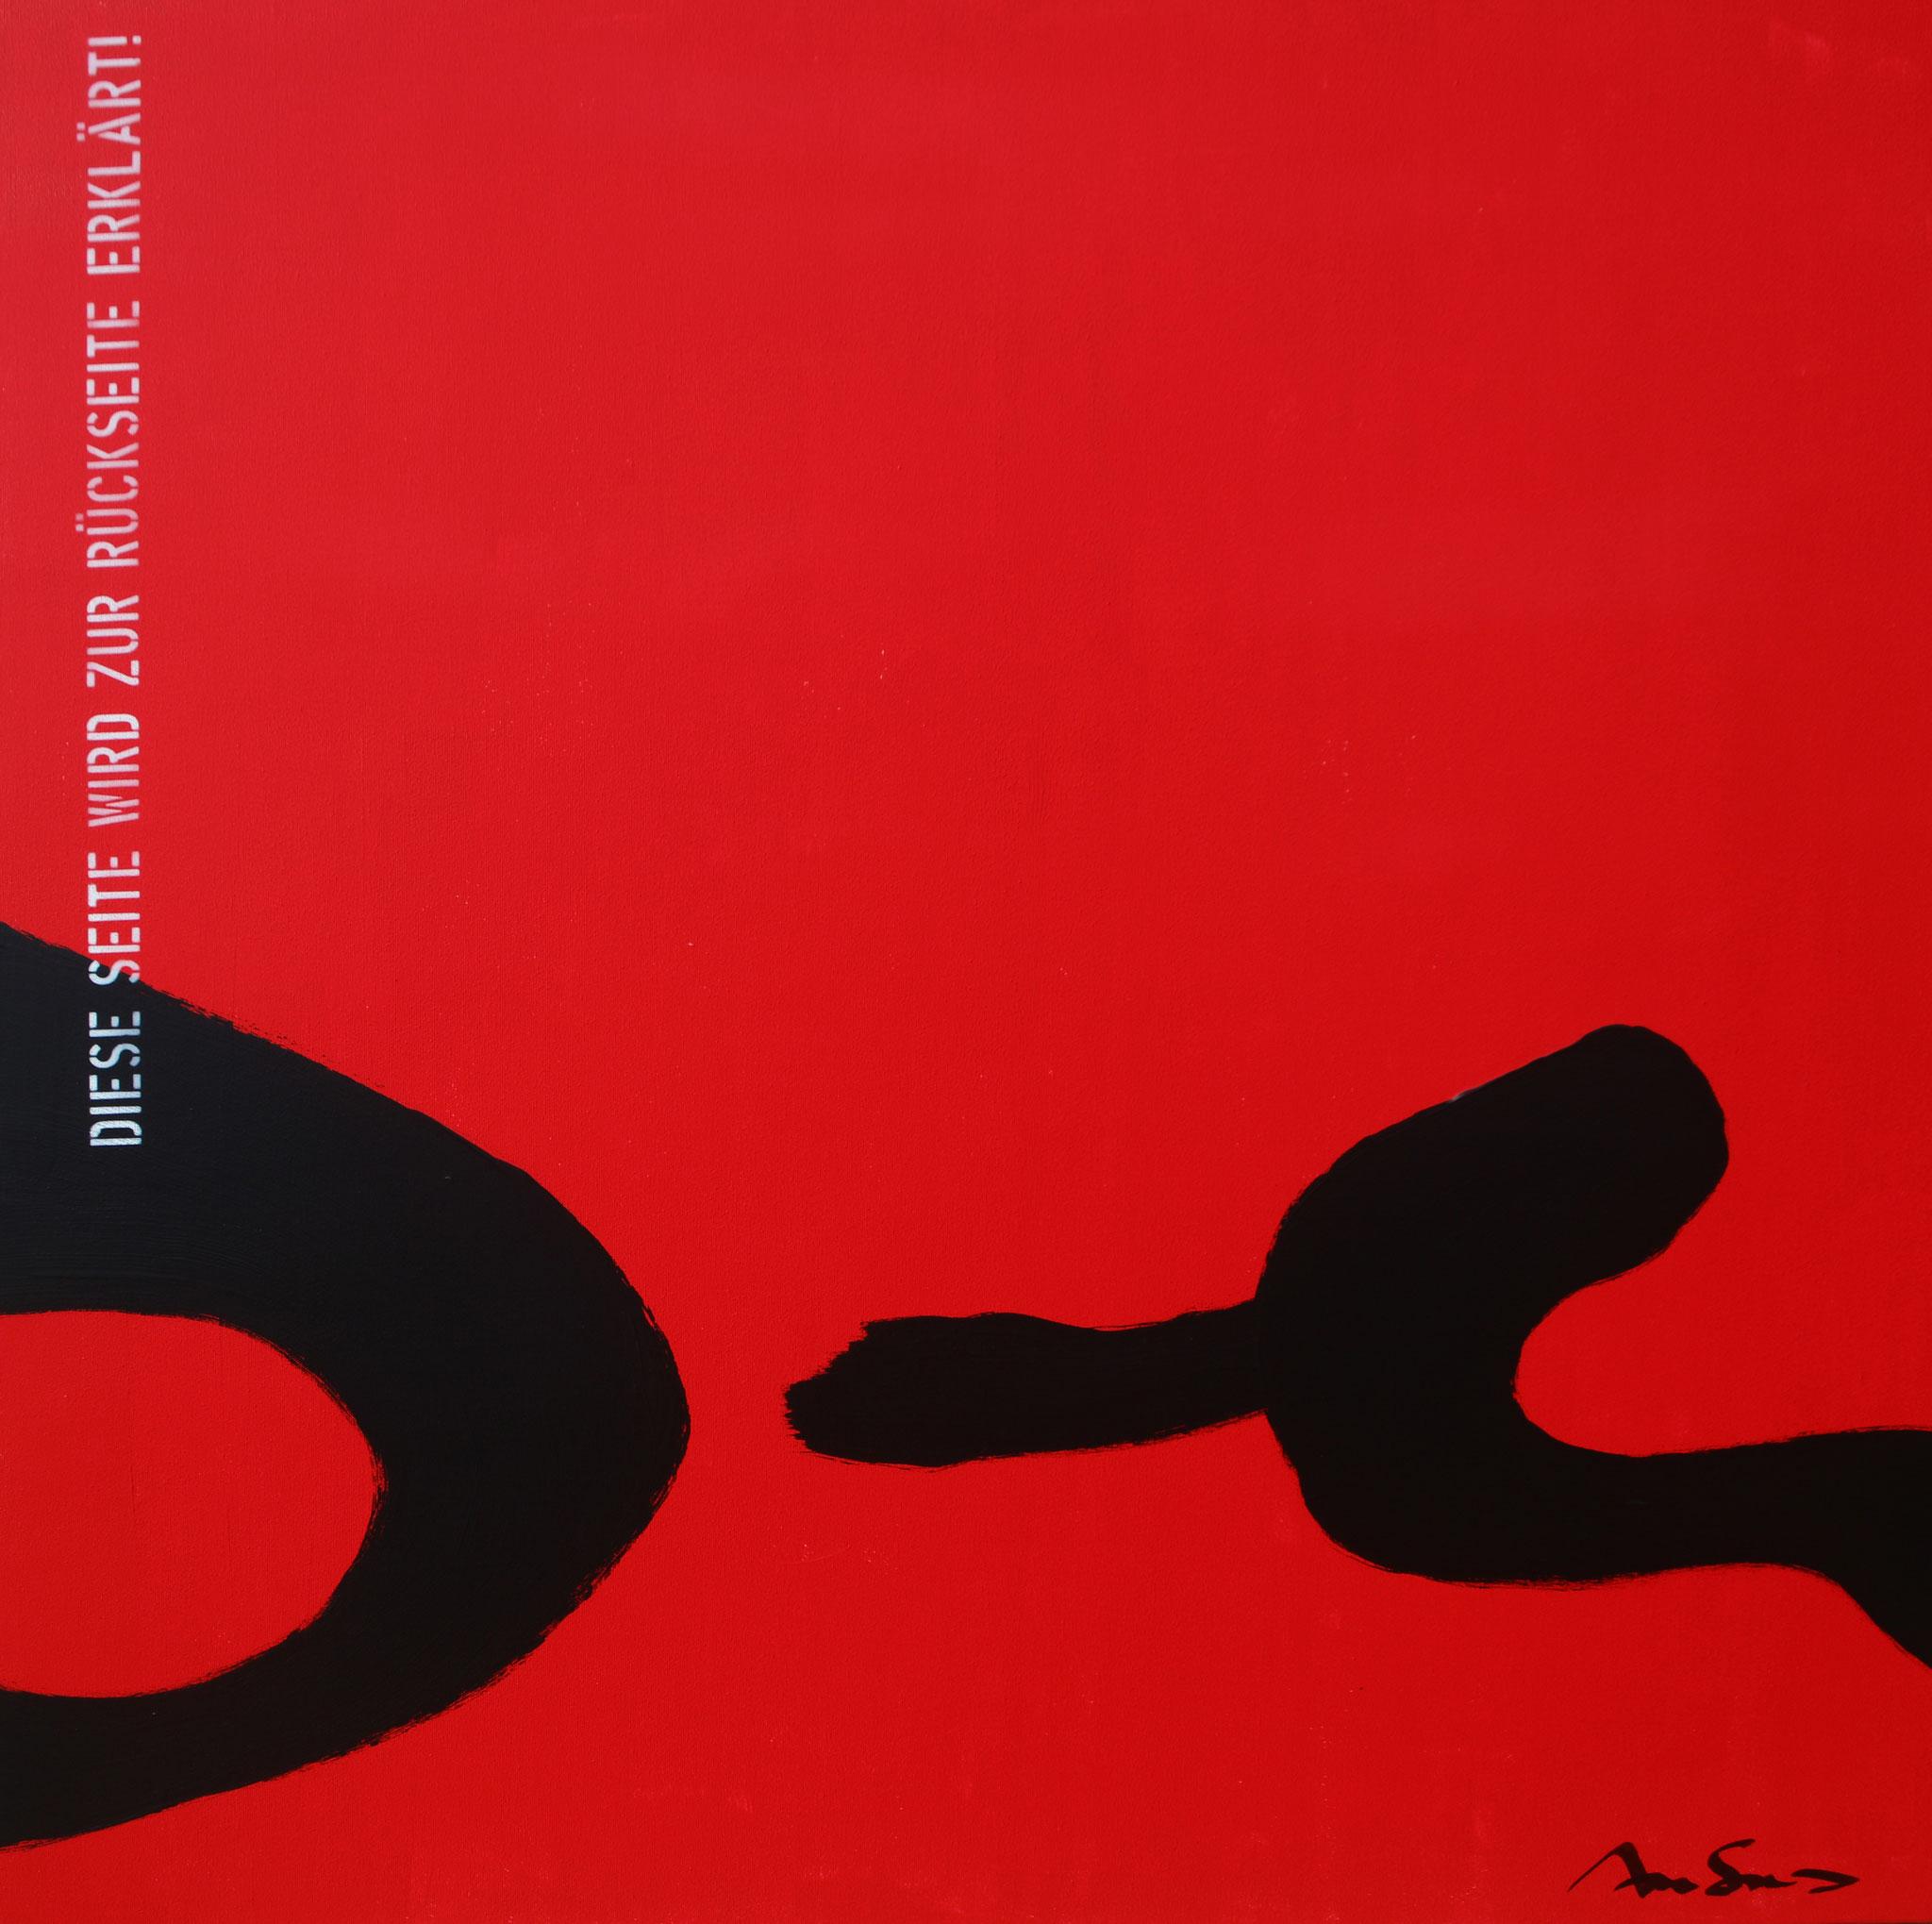 Heureka XII - Rückseite - Acryl-/Mischtechnik auf Leinwand - 100 x 100 cm